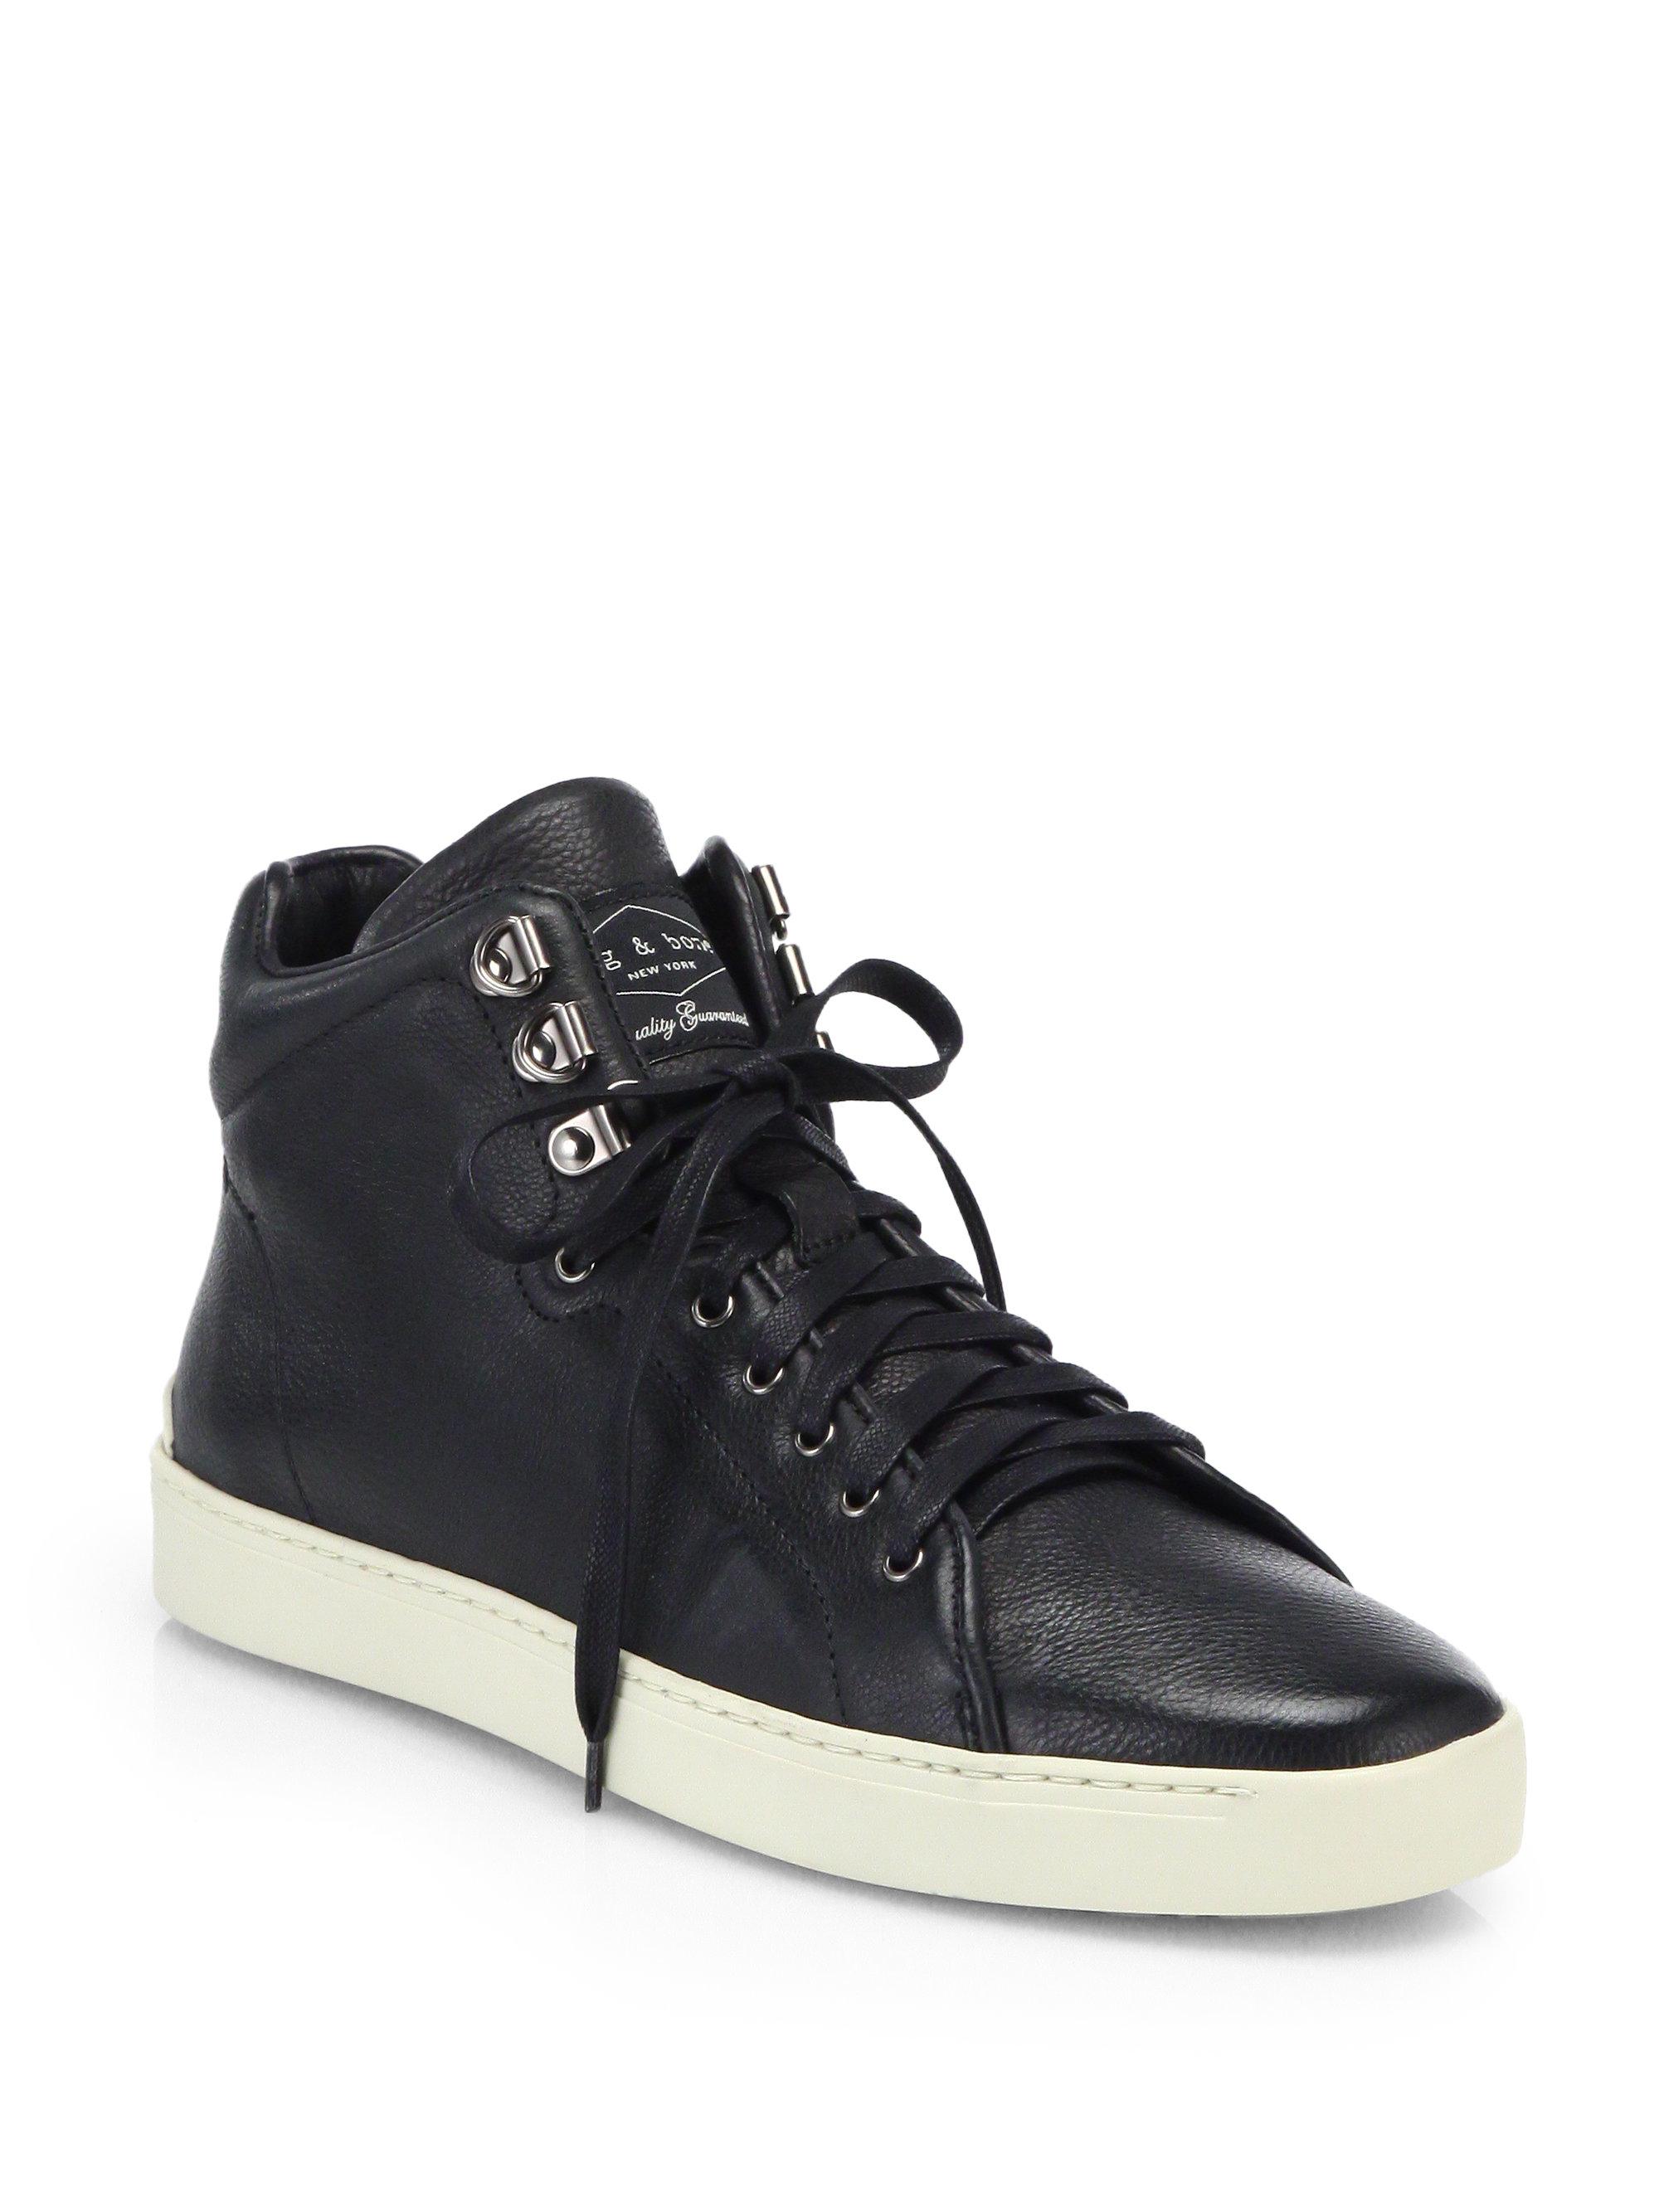 ebay cheap price online cheap price Rag & Bone Leather High-Top Sneakers w/ Tags original sale online authentic sale online cheap sale latest ASrcT